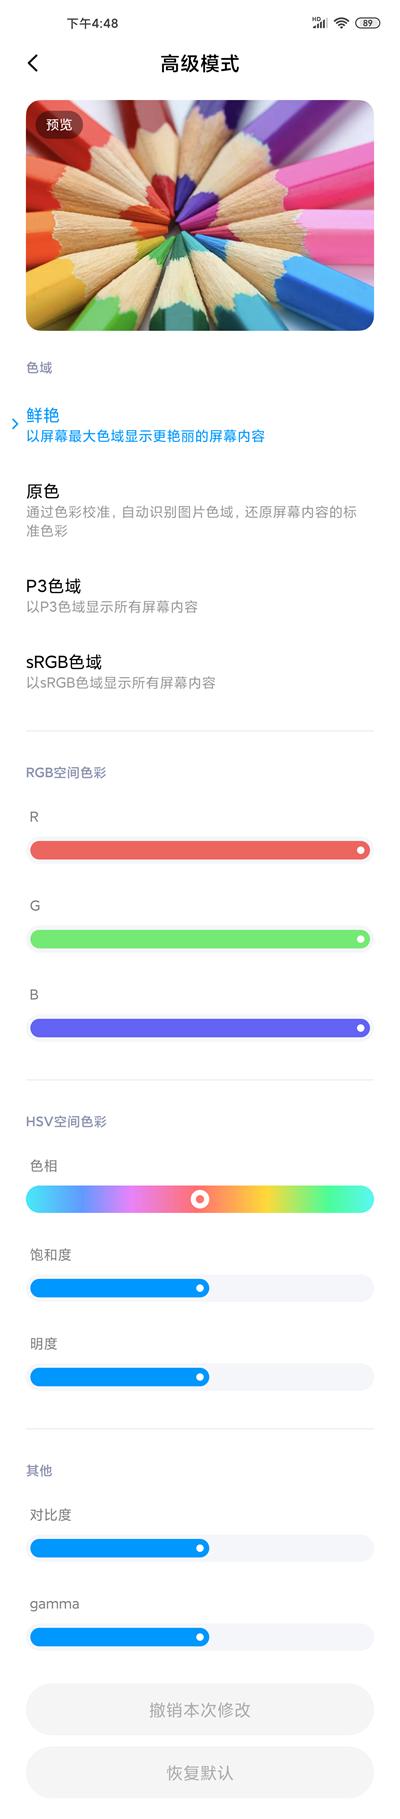 Screenshot_2020-02-14-16-48-14-083_com.xiaomi.misettings